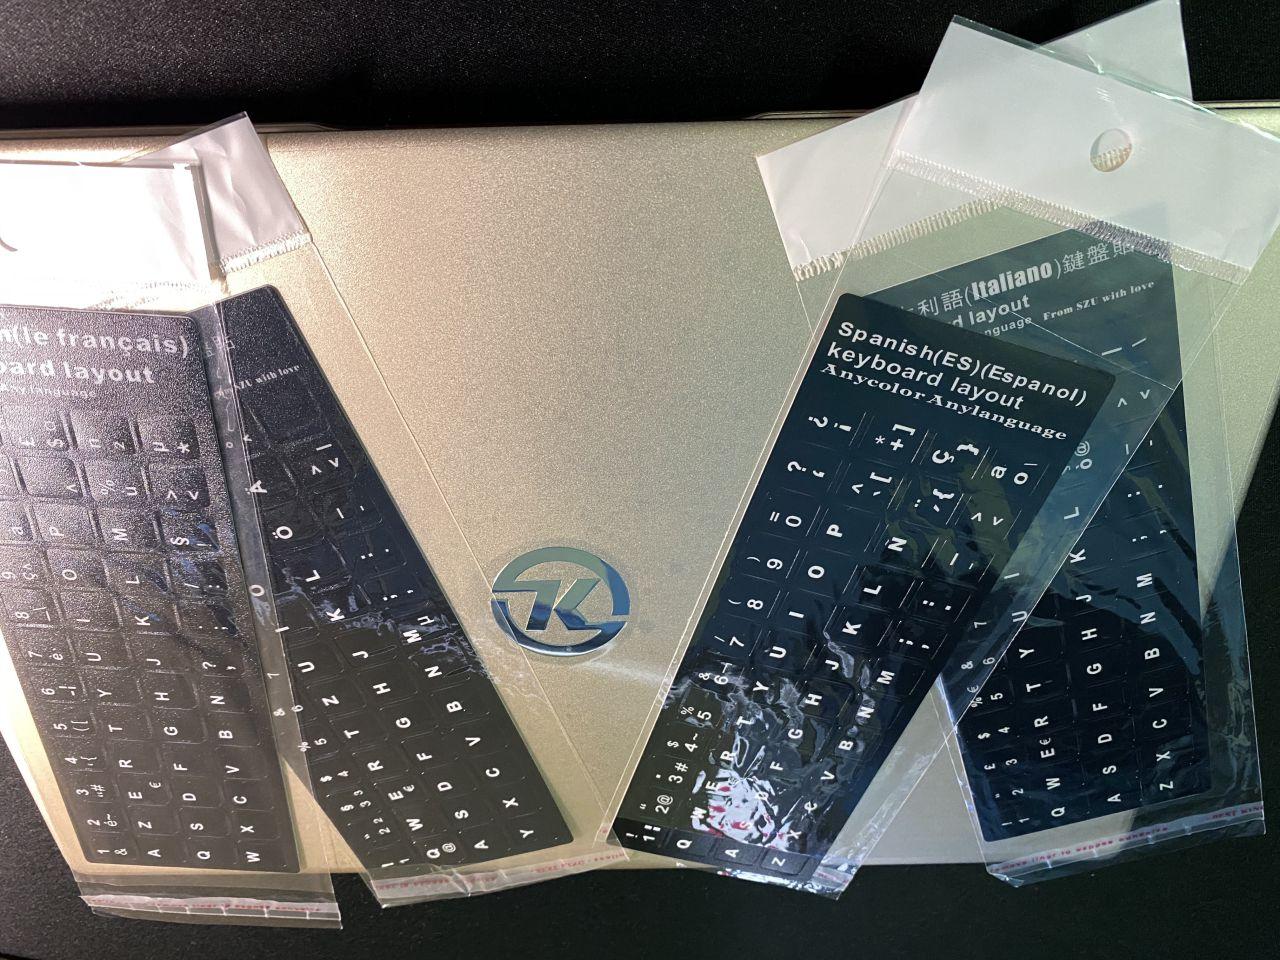 recensione-kuu-k2-2-1 Recensione KUU K2: Ultrabook Cinese 2020